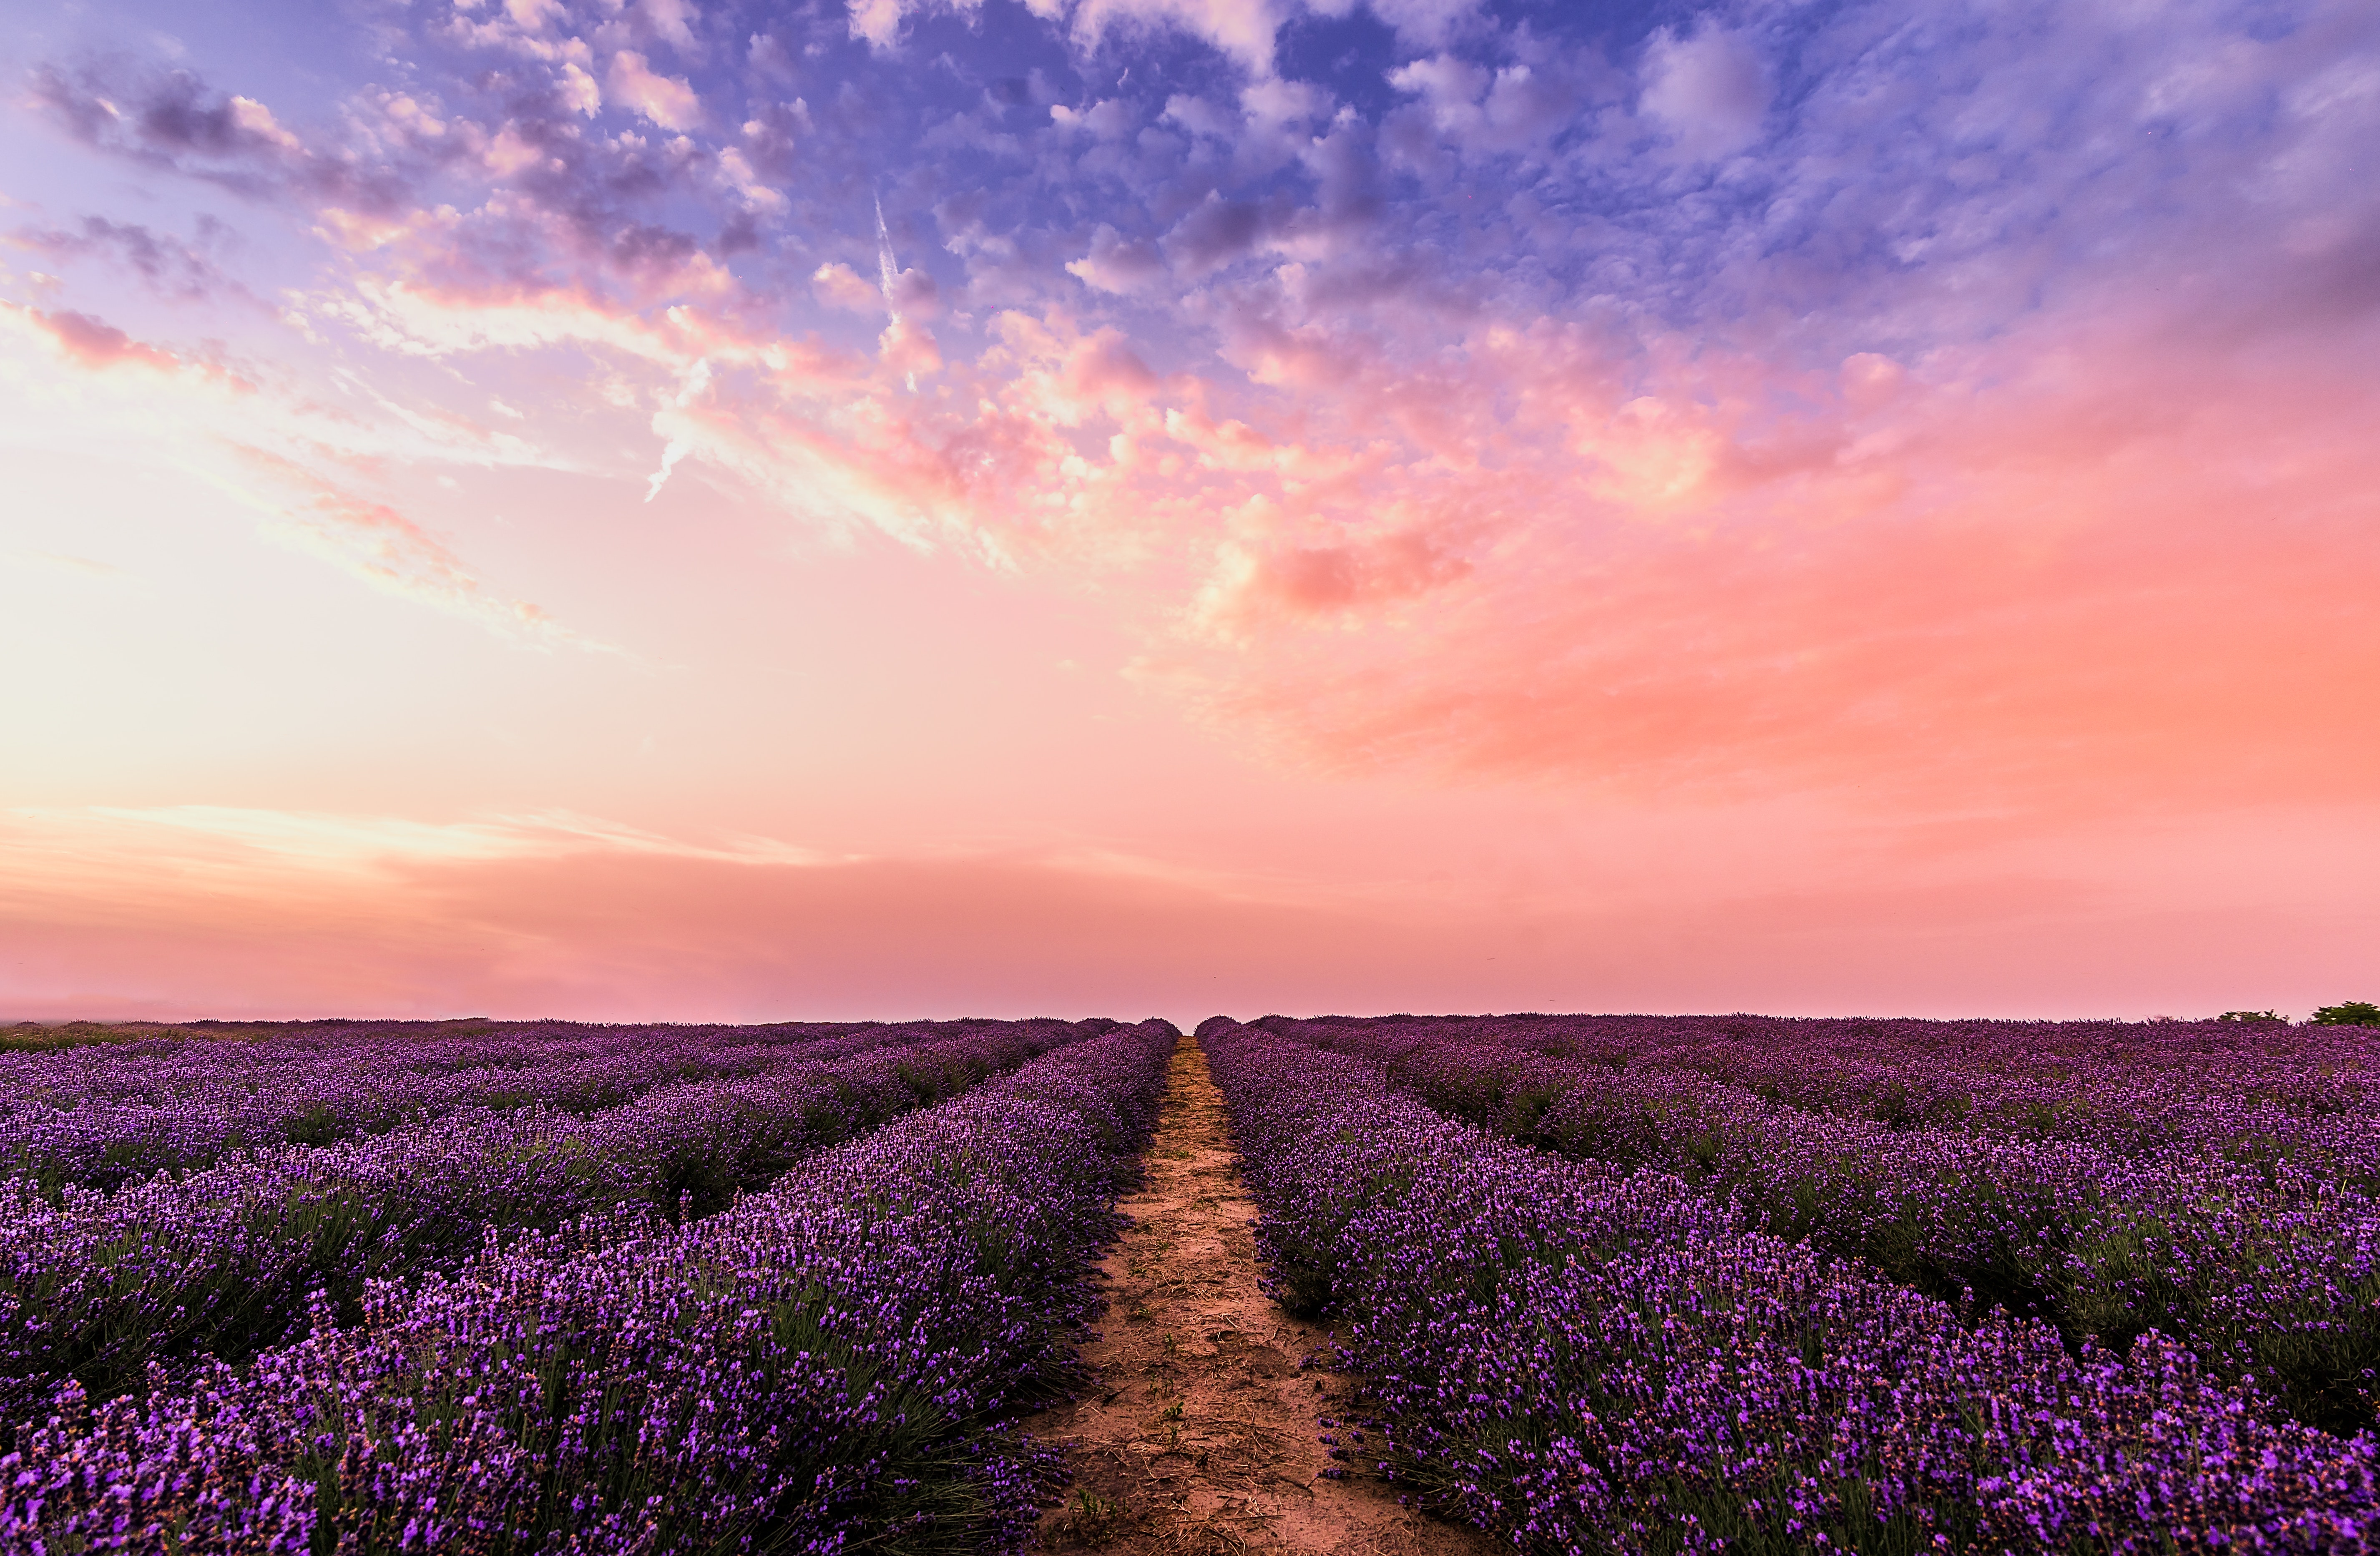 lavender field under pink sky 1574937360 - Lavender Field Under Pink Sky -